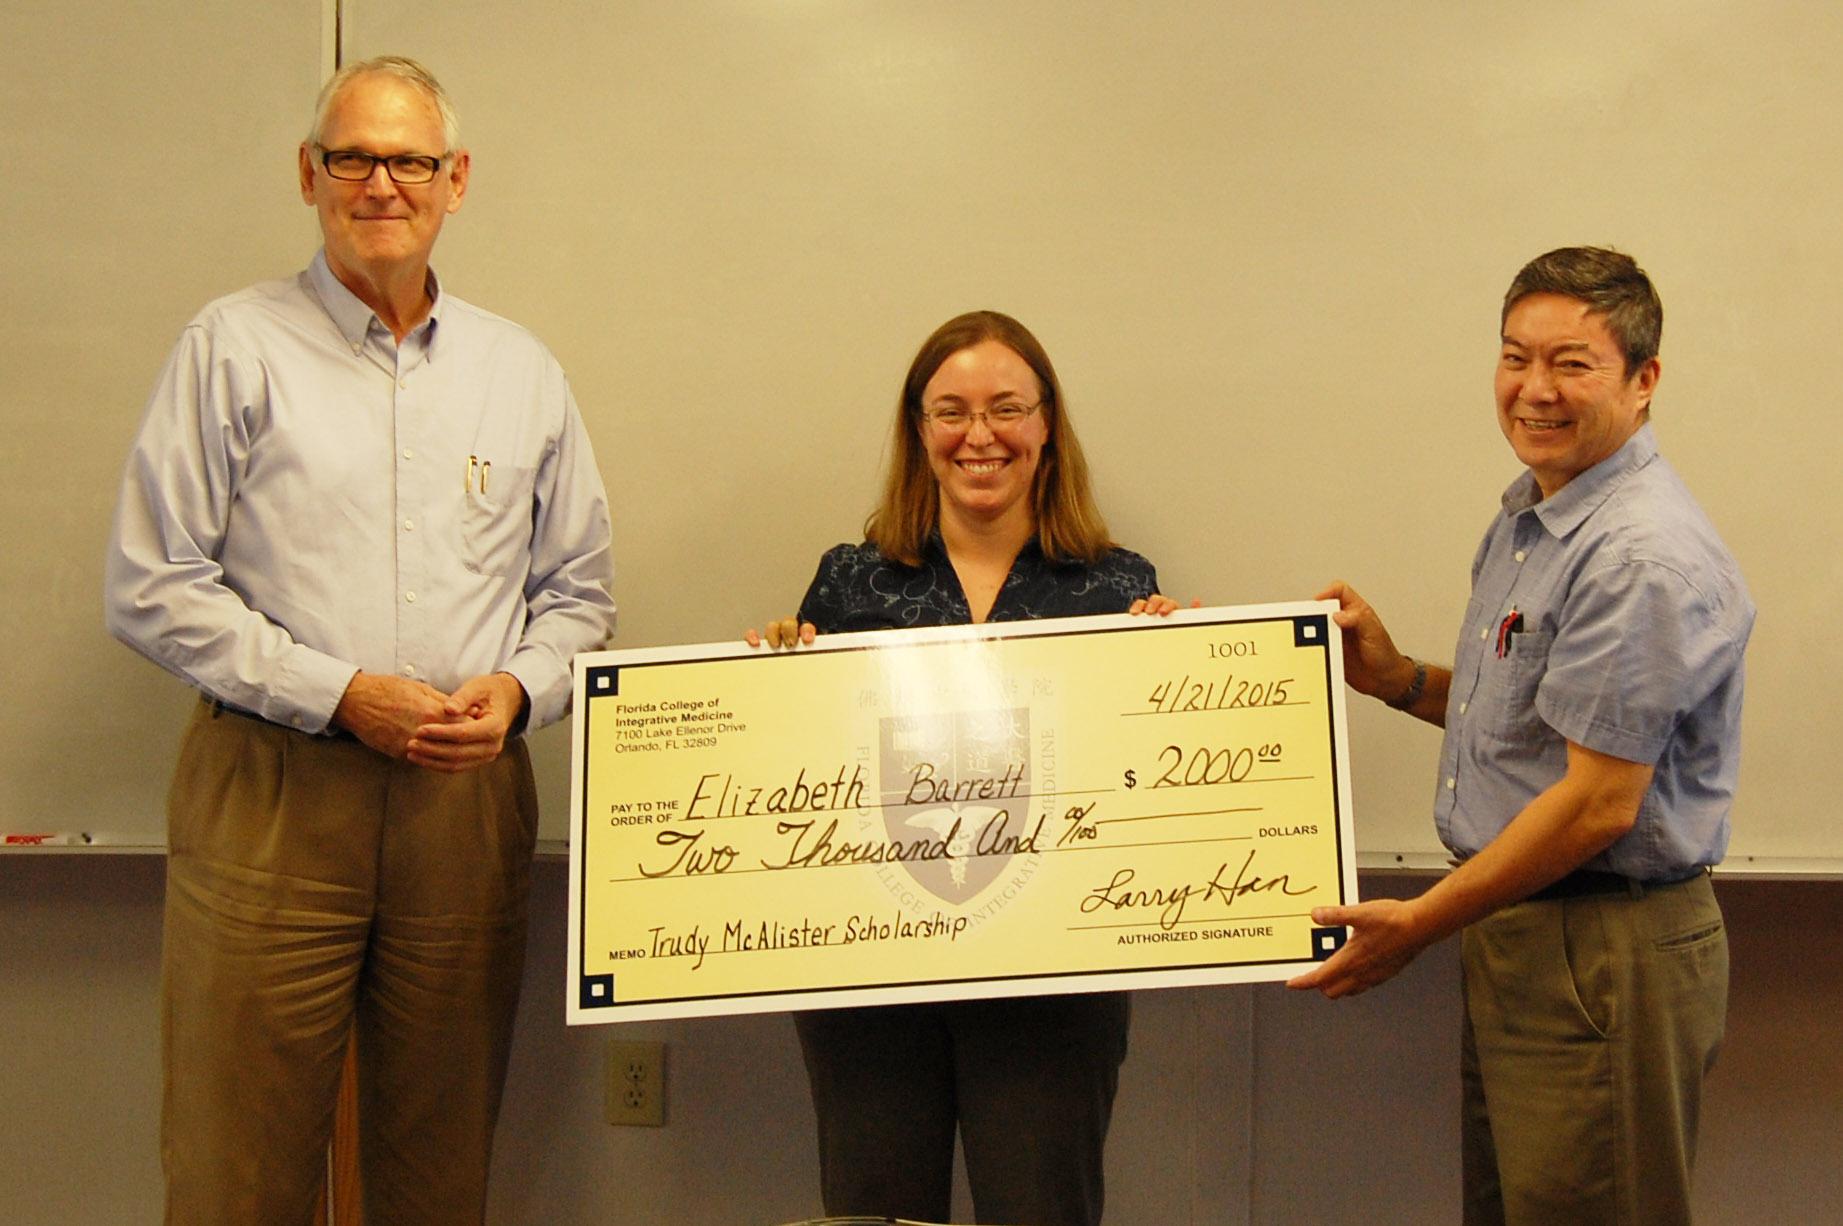 Trudy McAlister Scholarship Fund 2015 Award Recipient: Elizabeth B. Barrett